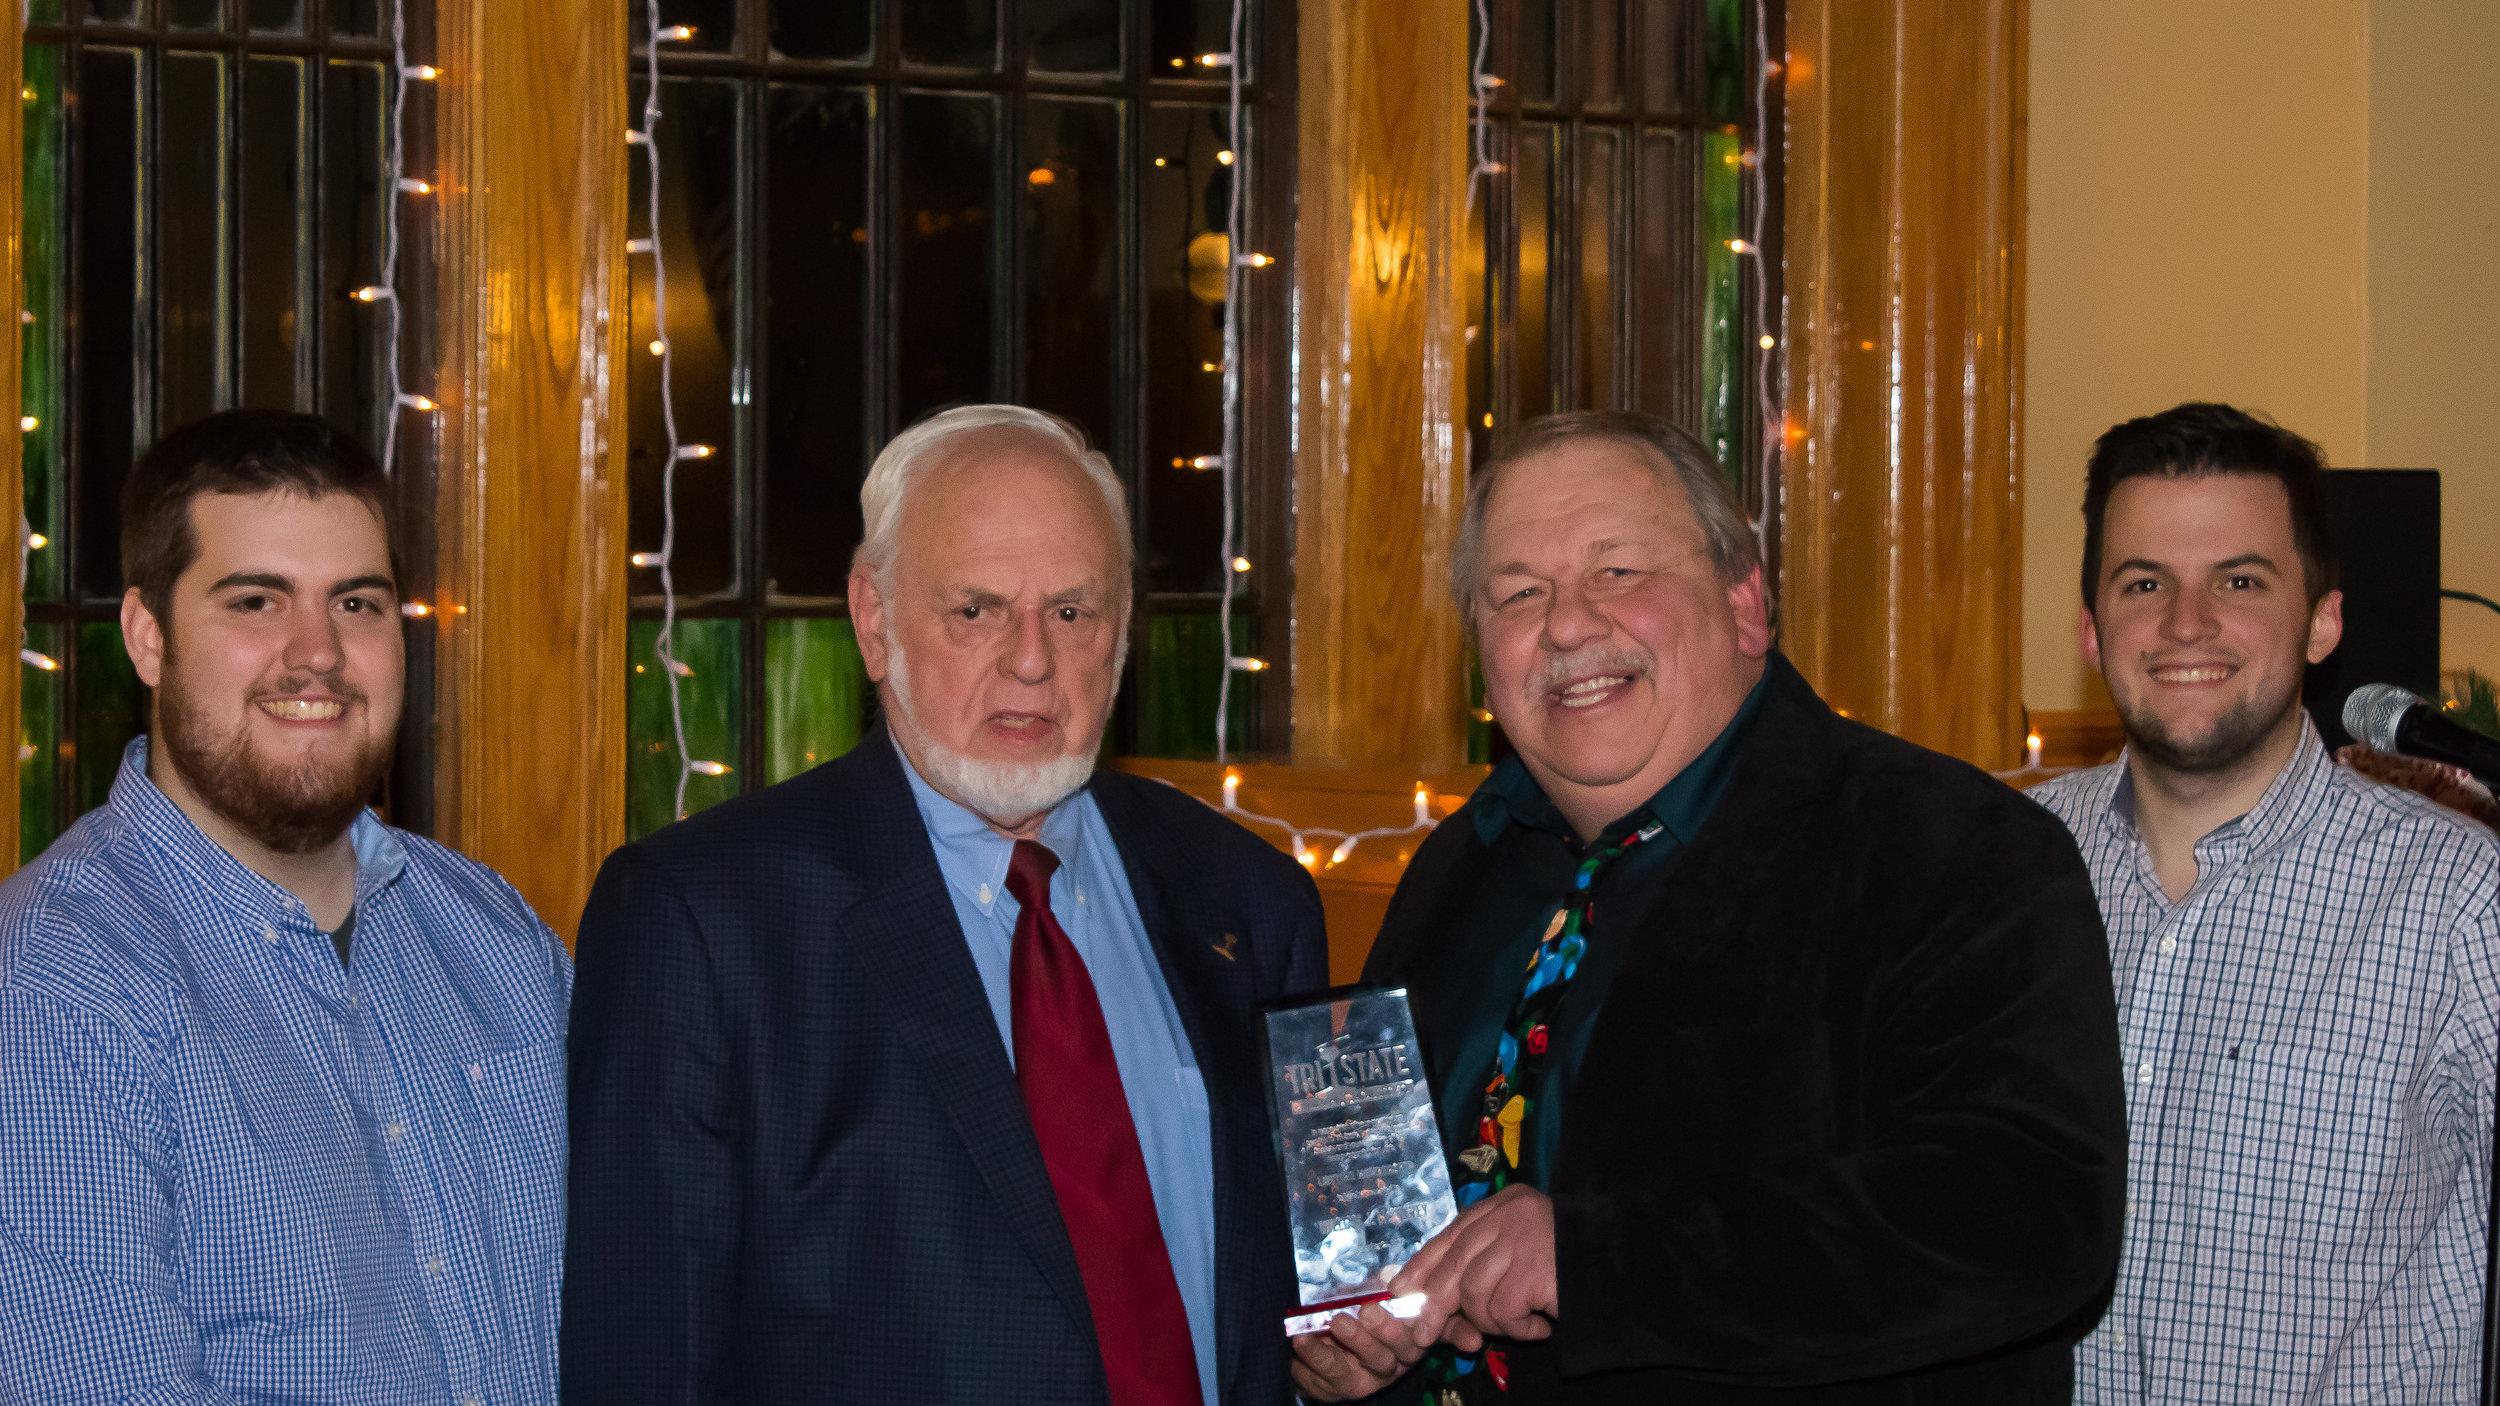 Member William McKevley receives his Lifetime Membership award. From Left to right, Vice President Kevin Phalon, William McKelvey, President Michael Del Vecchio, and Treasurer Richard King.